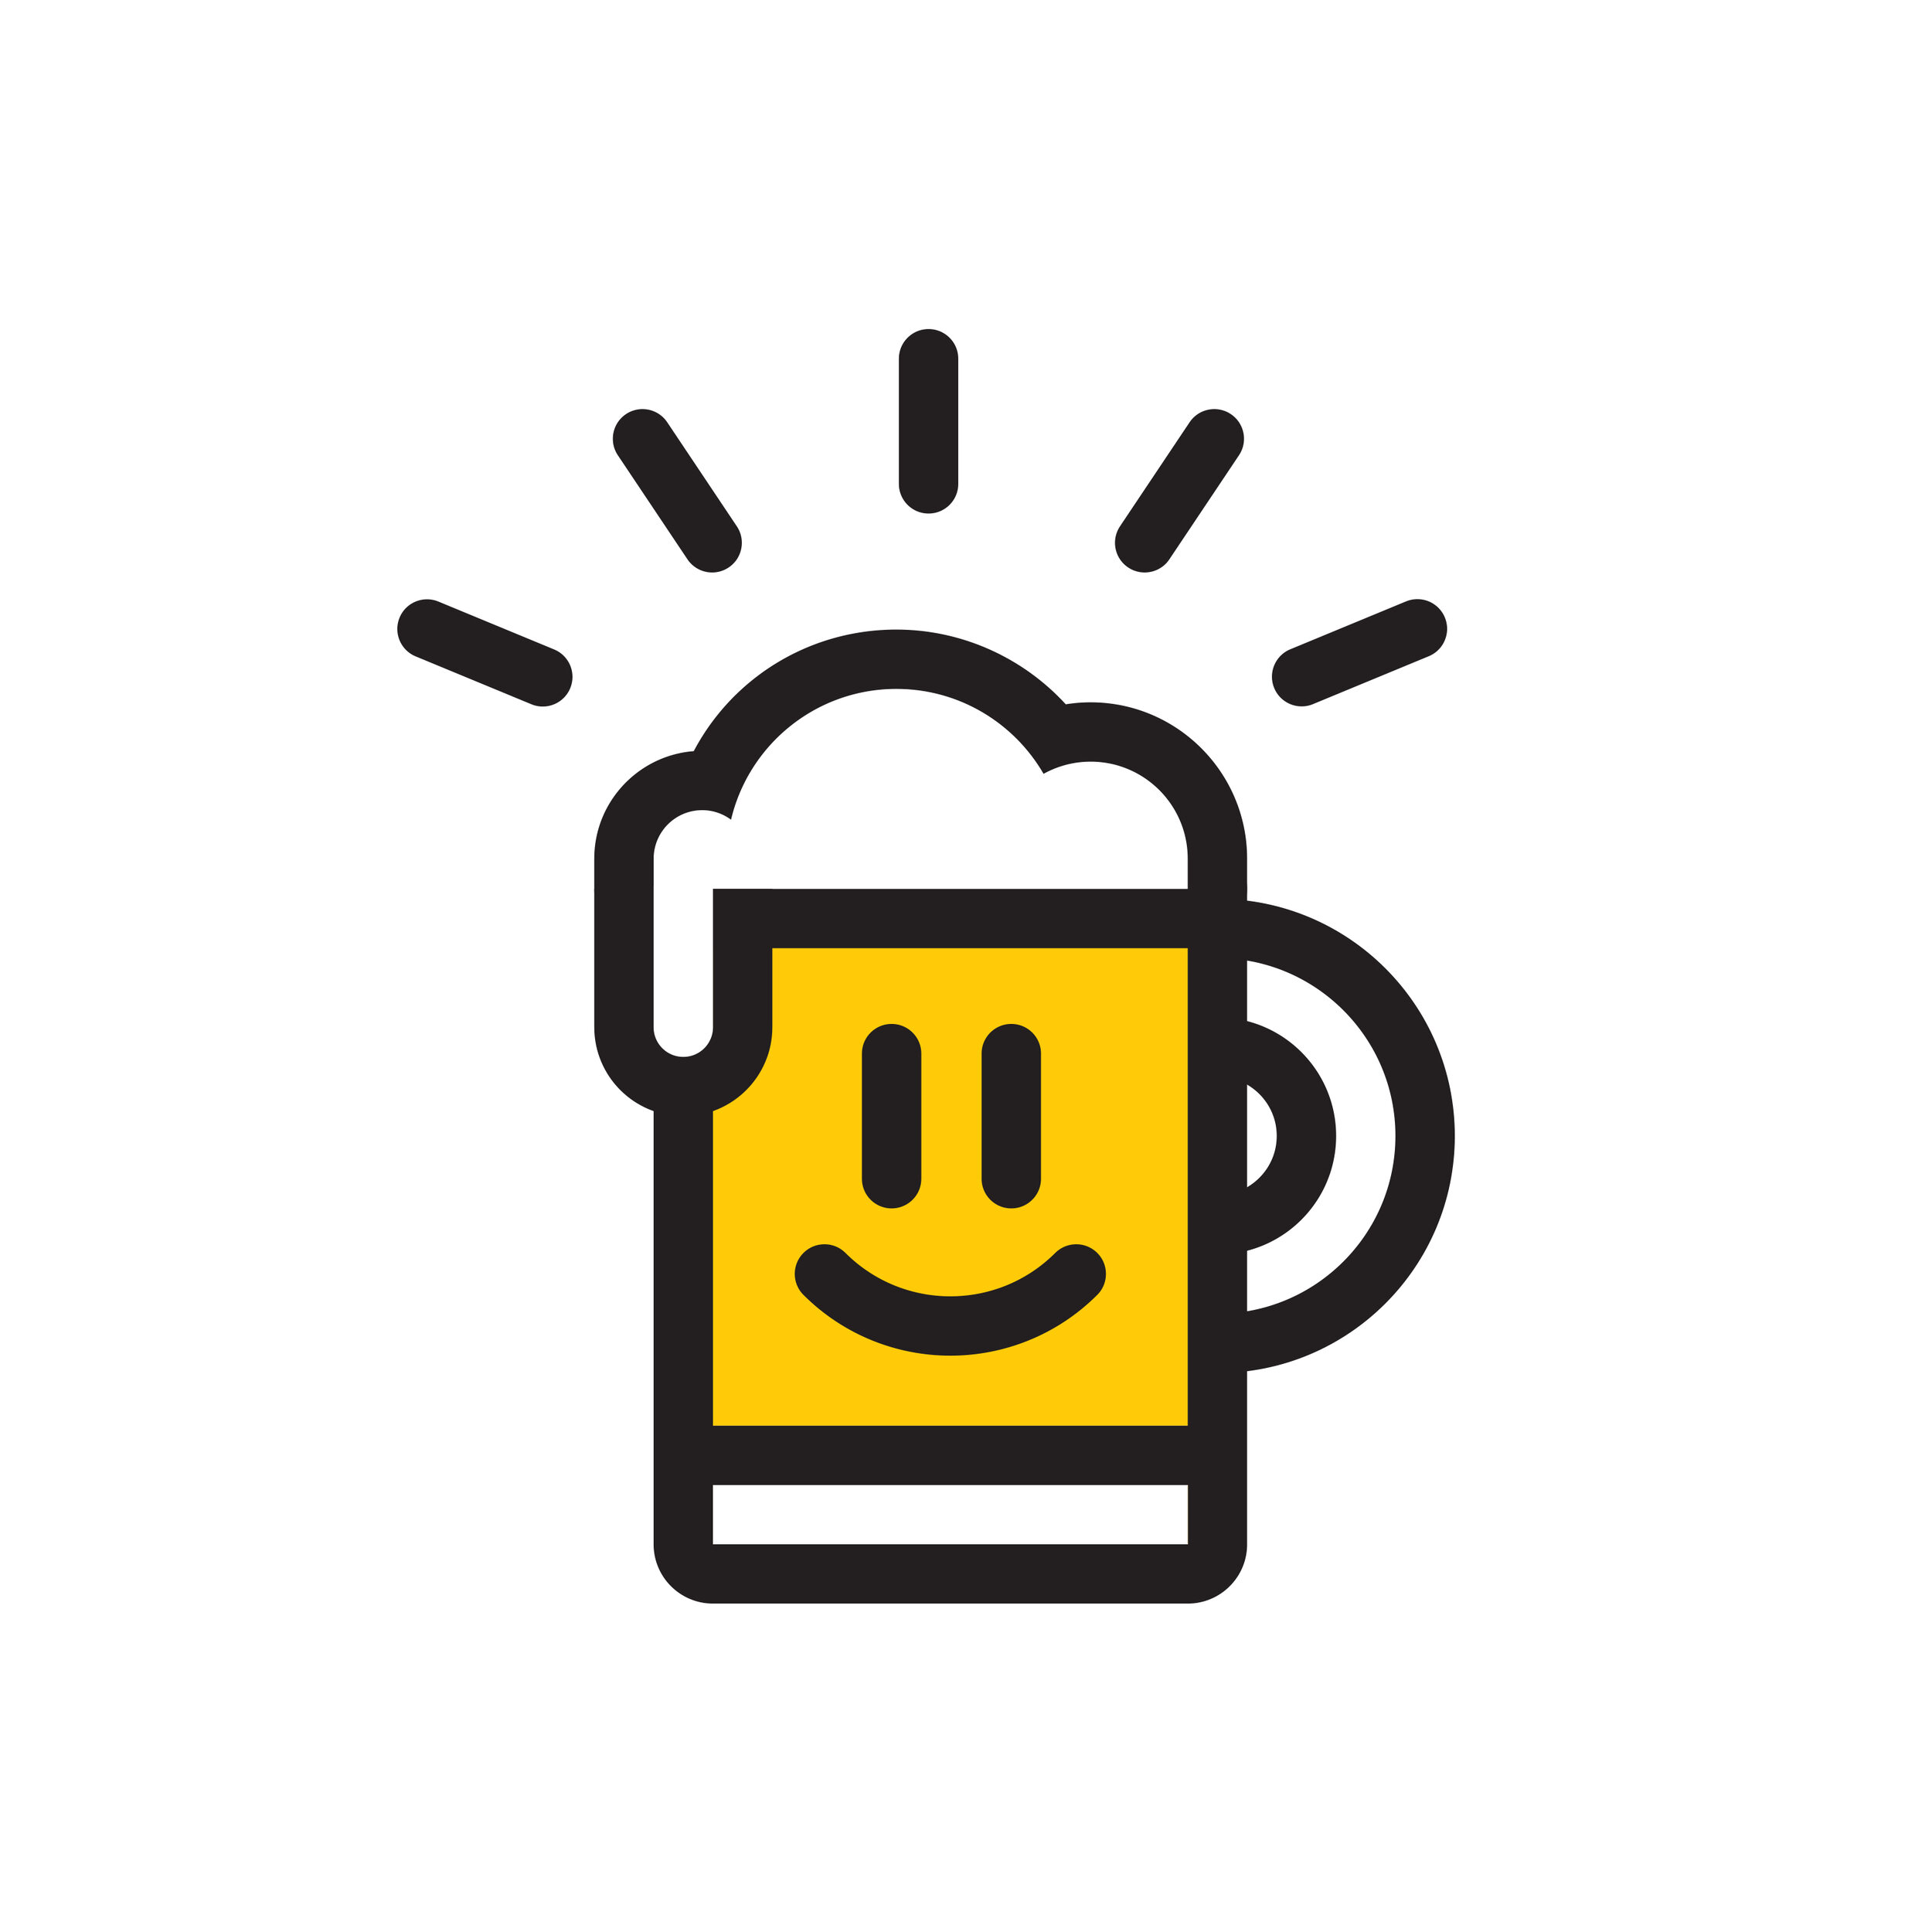 happy_beer_icon.jpg